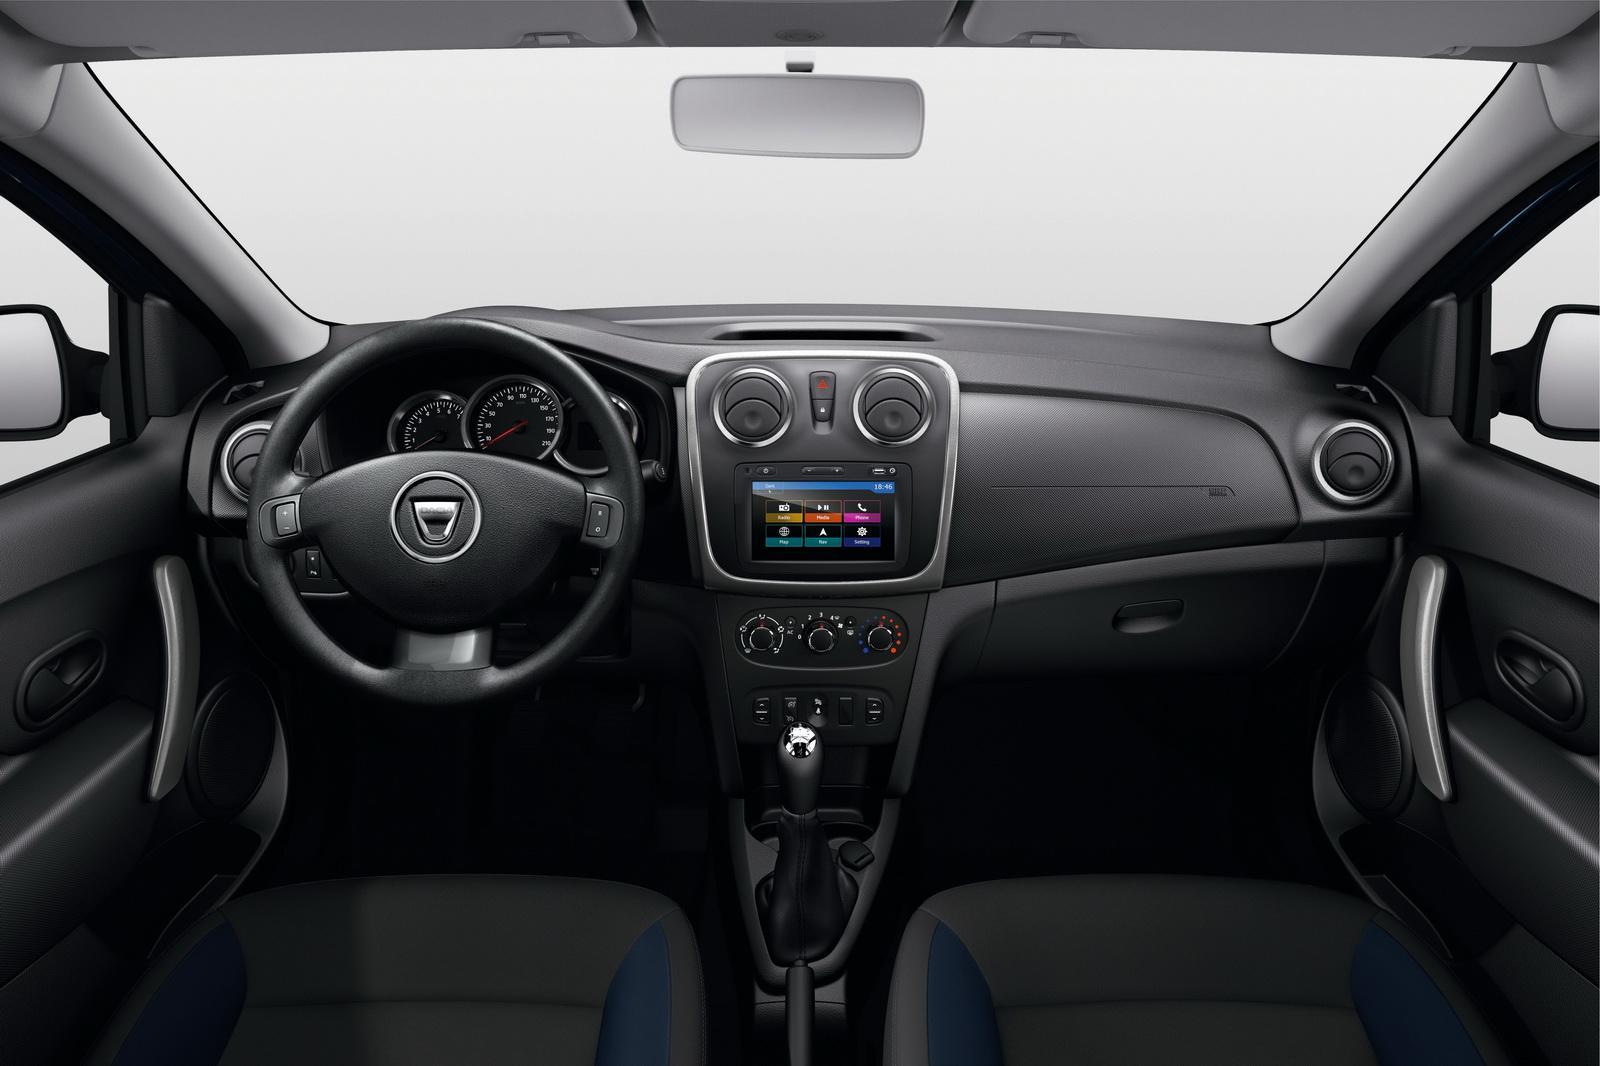 Dacia Sandero Anniversary